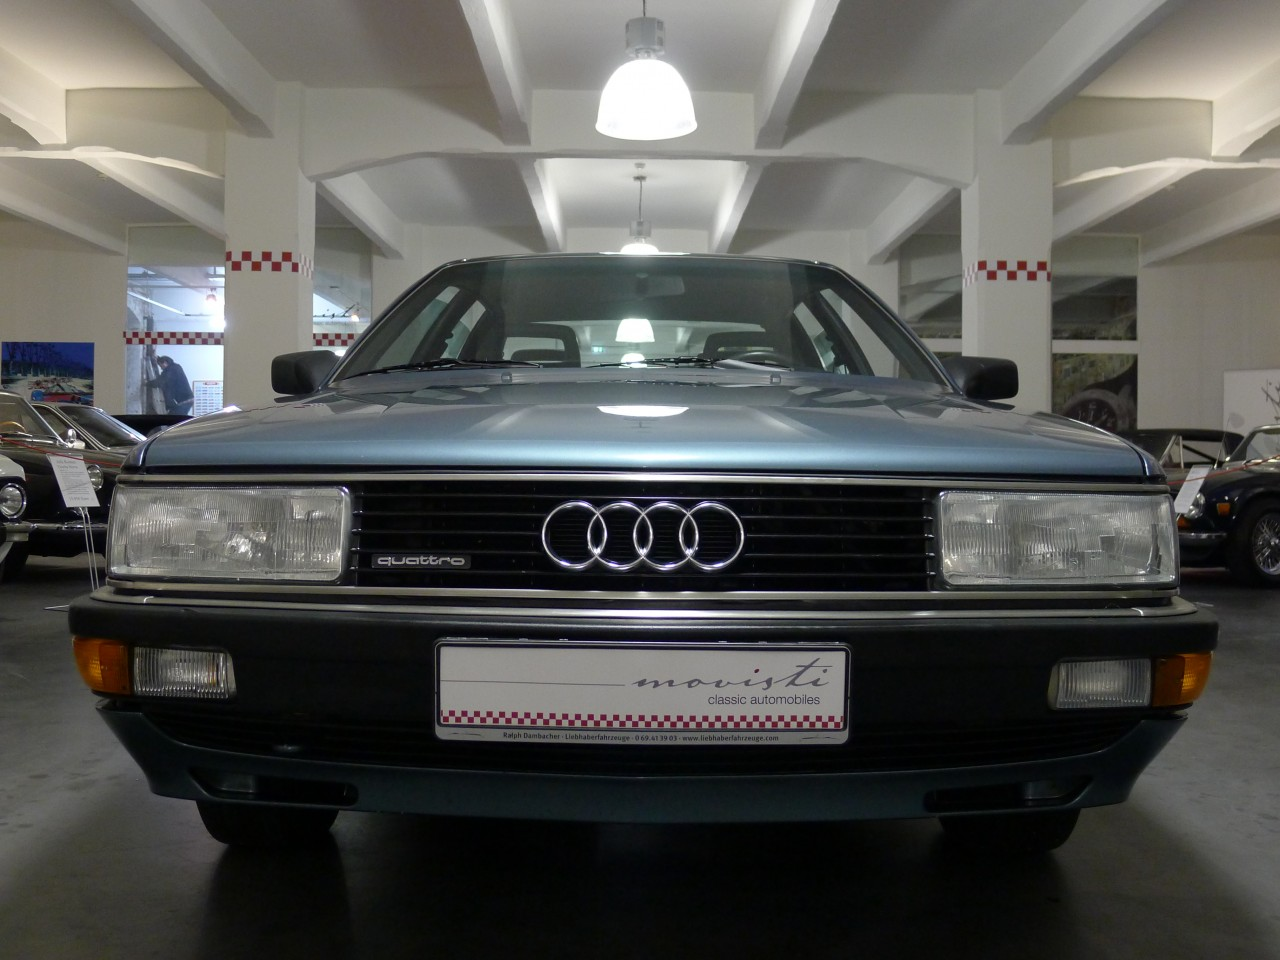 Audi 200 Quattro 171 Movisti Classic Automobiles